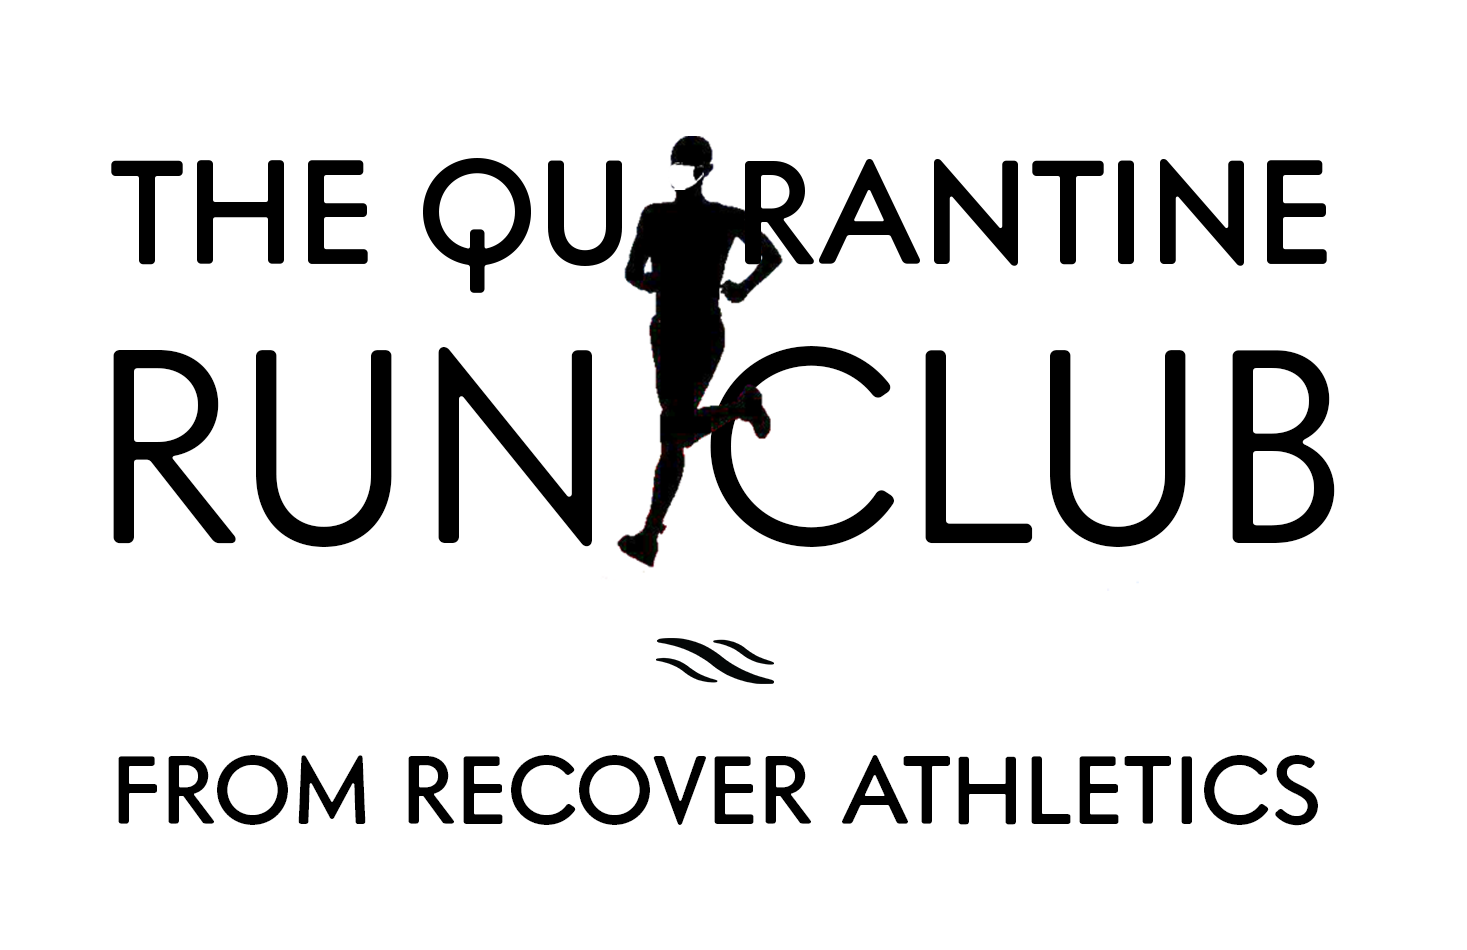 QRC Logo _recover athletics